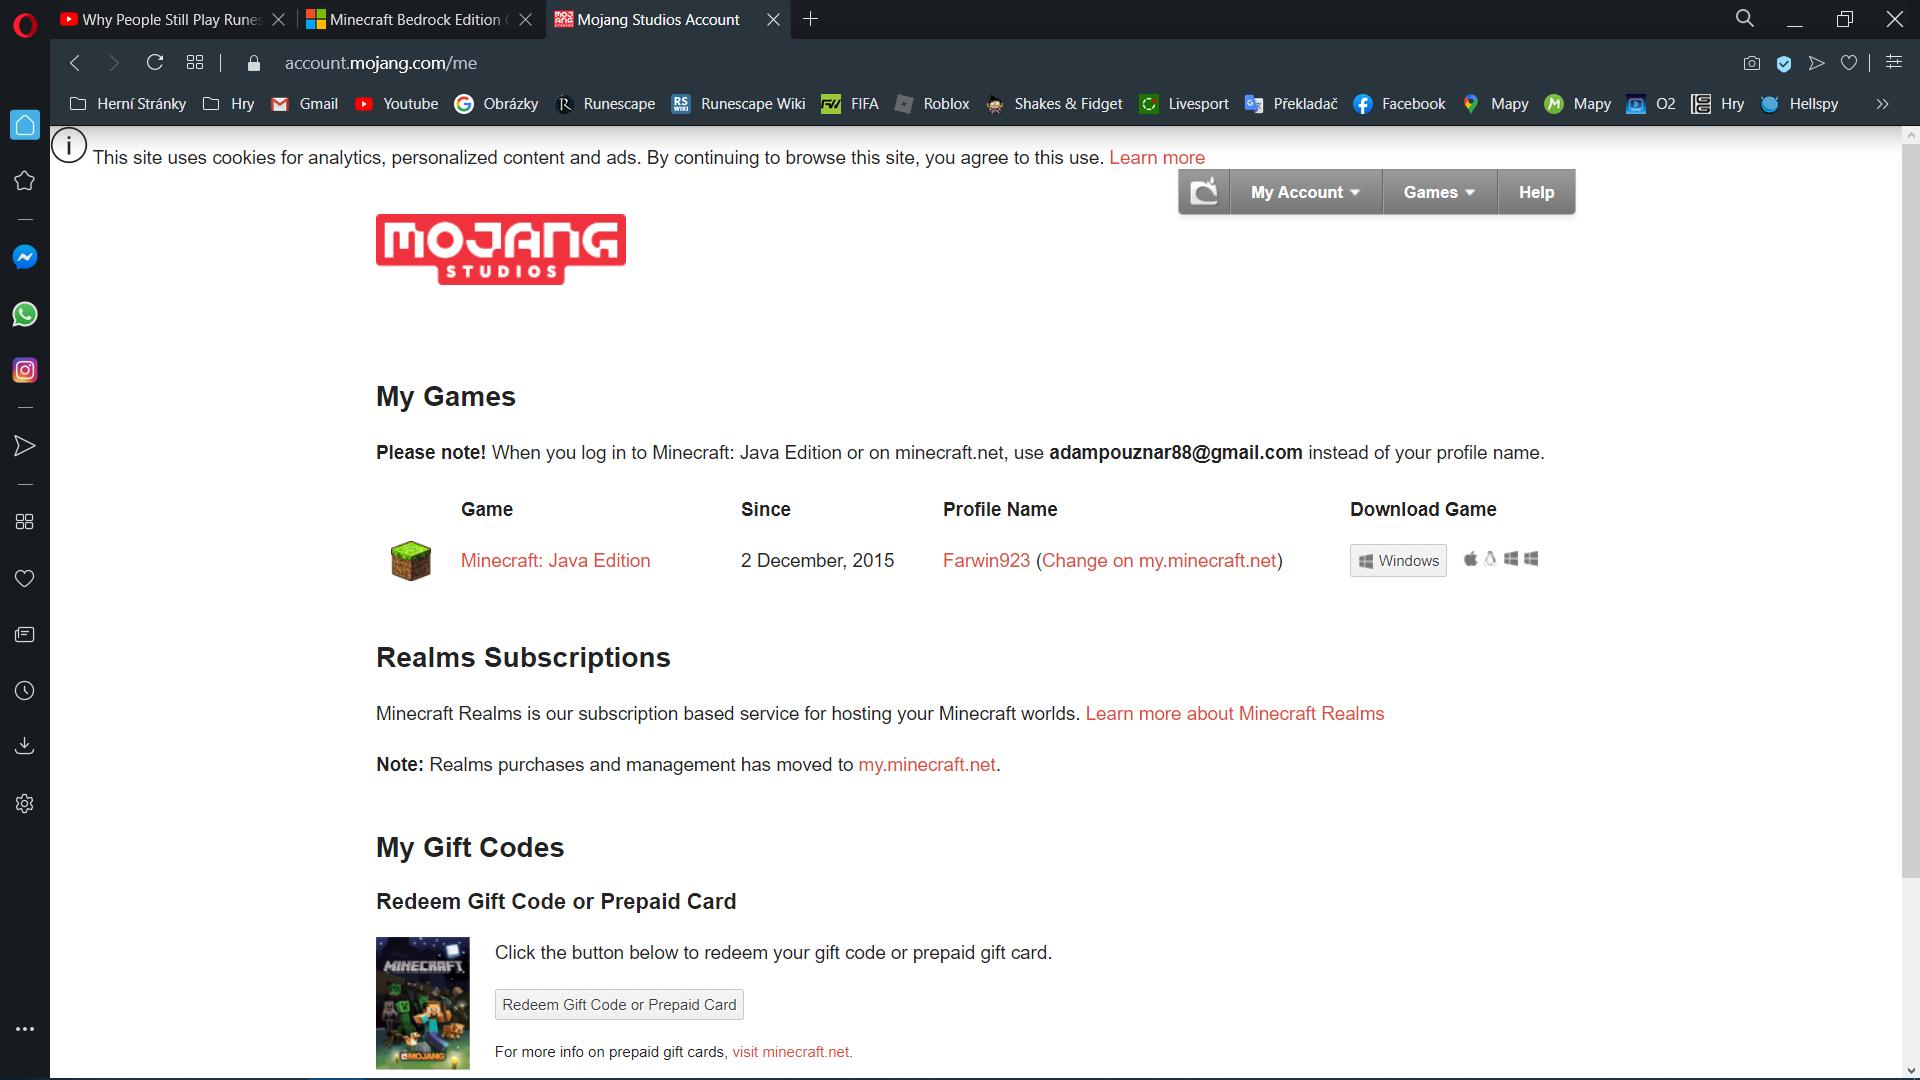 Minecraft Bedrock Edition 650b85e1-e838-4855-b498-8f984651790a?upload=true.png